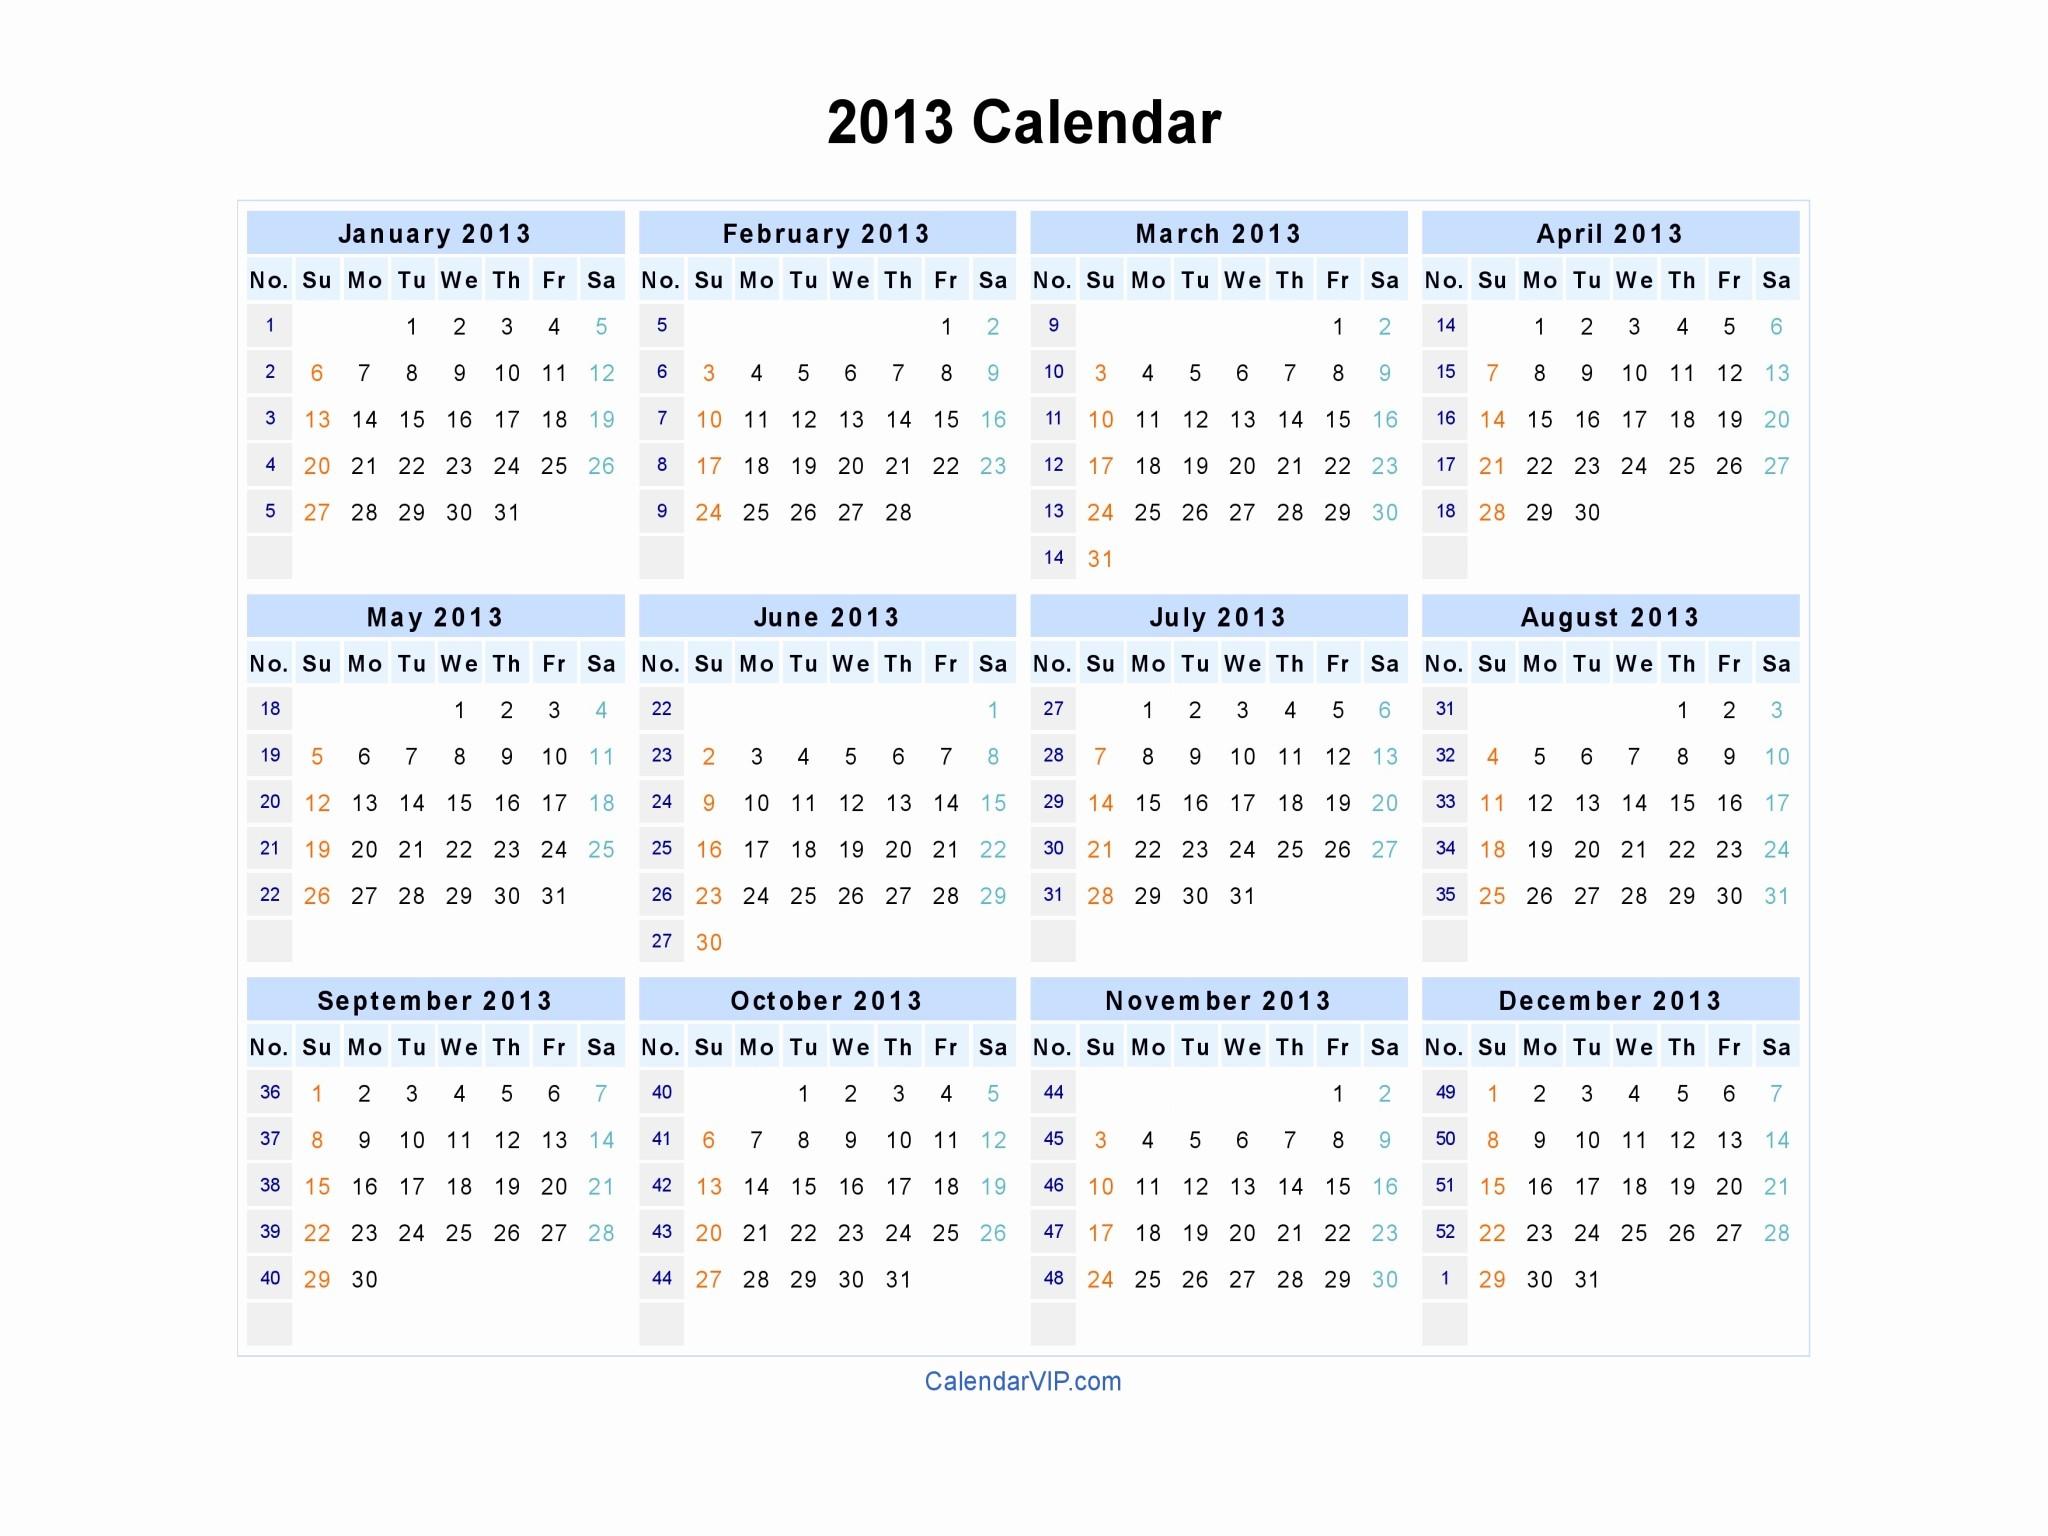 2013 Calendar Printable One Page Beautiful 2013 Calendar Blank Printable Calendar Template In Pdf